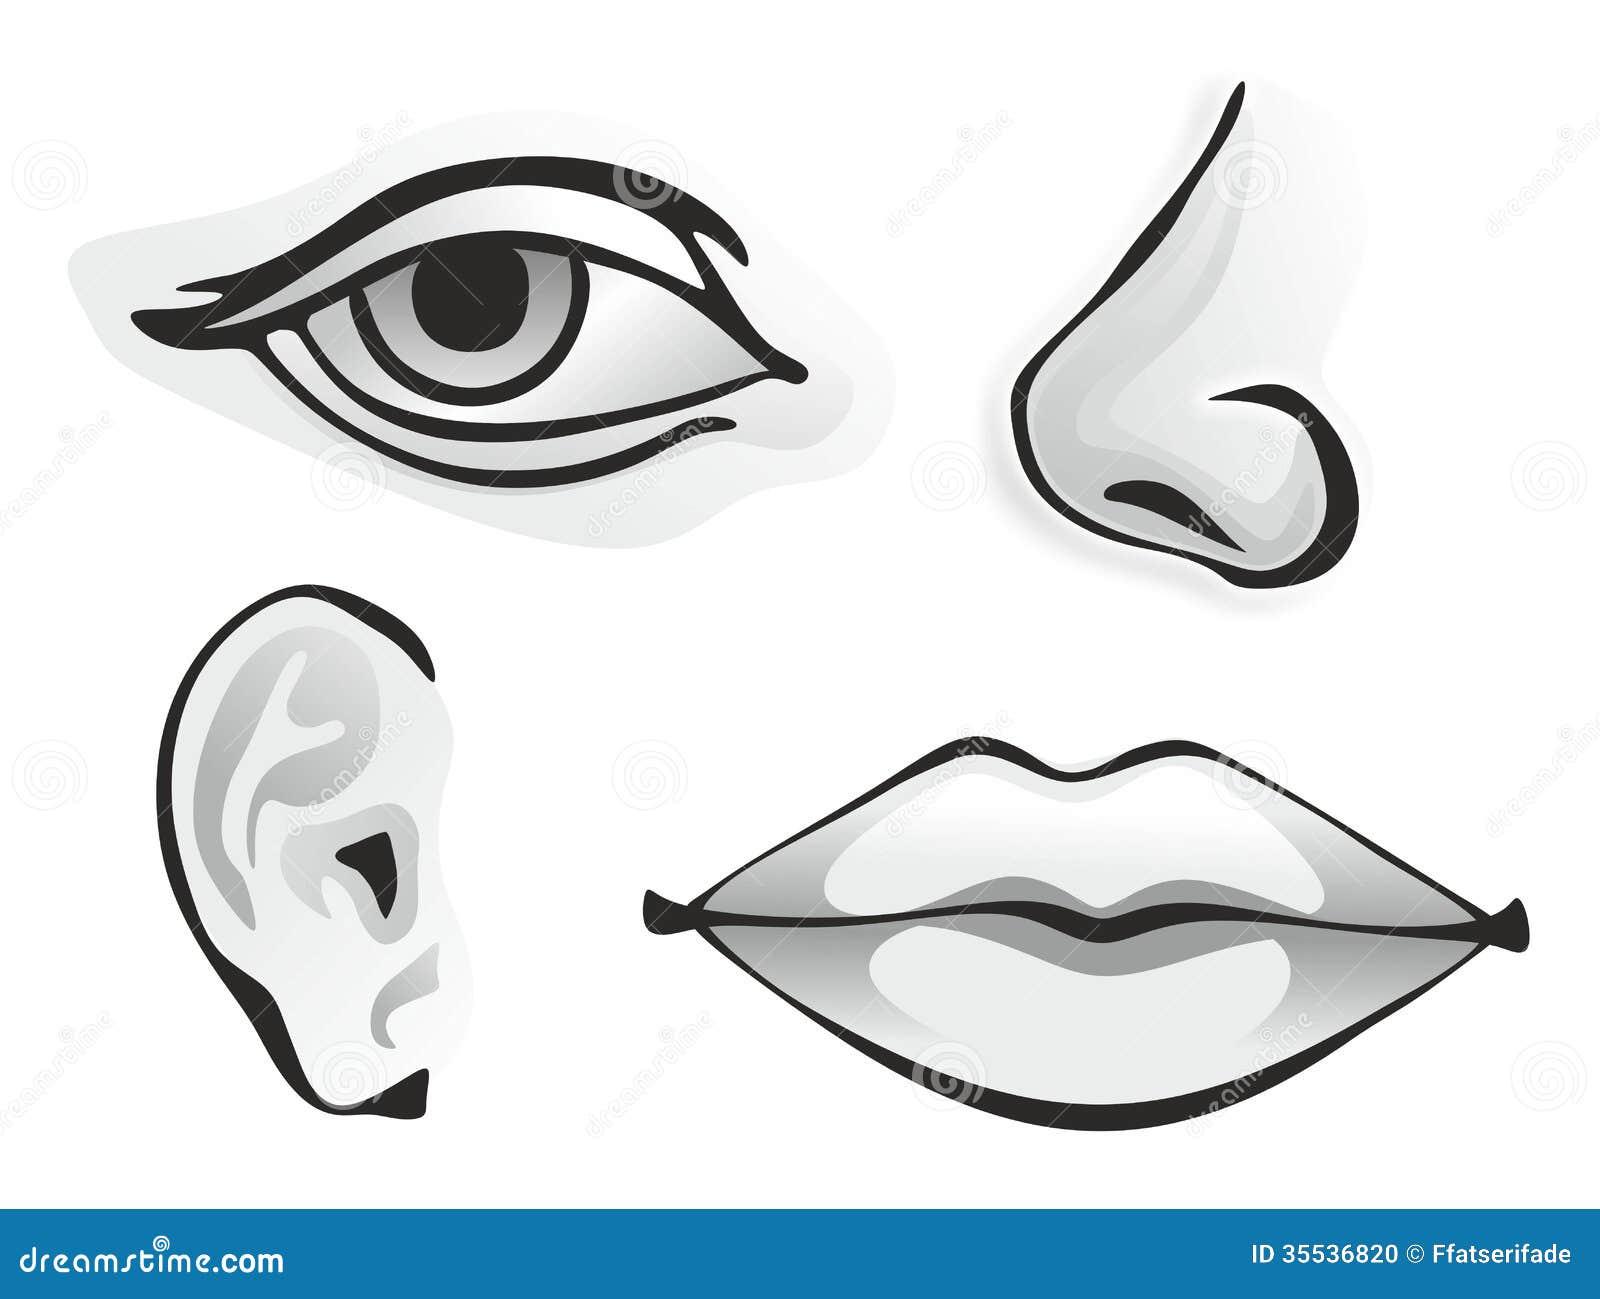 Sense organs stock photo. Image of feel, taste, nose - 35536820